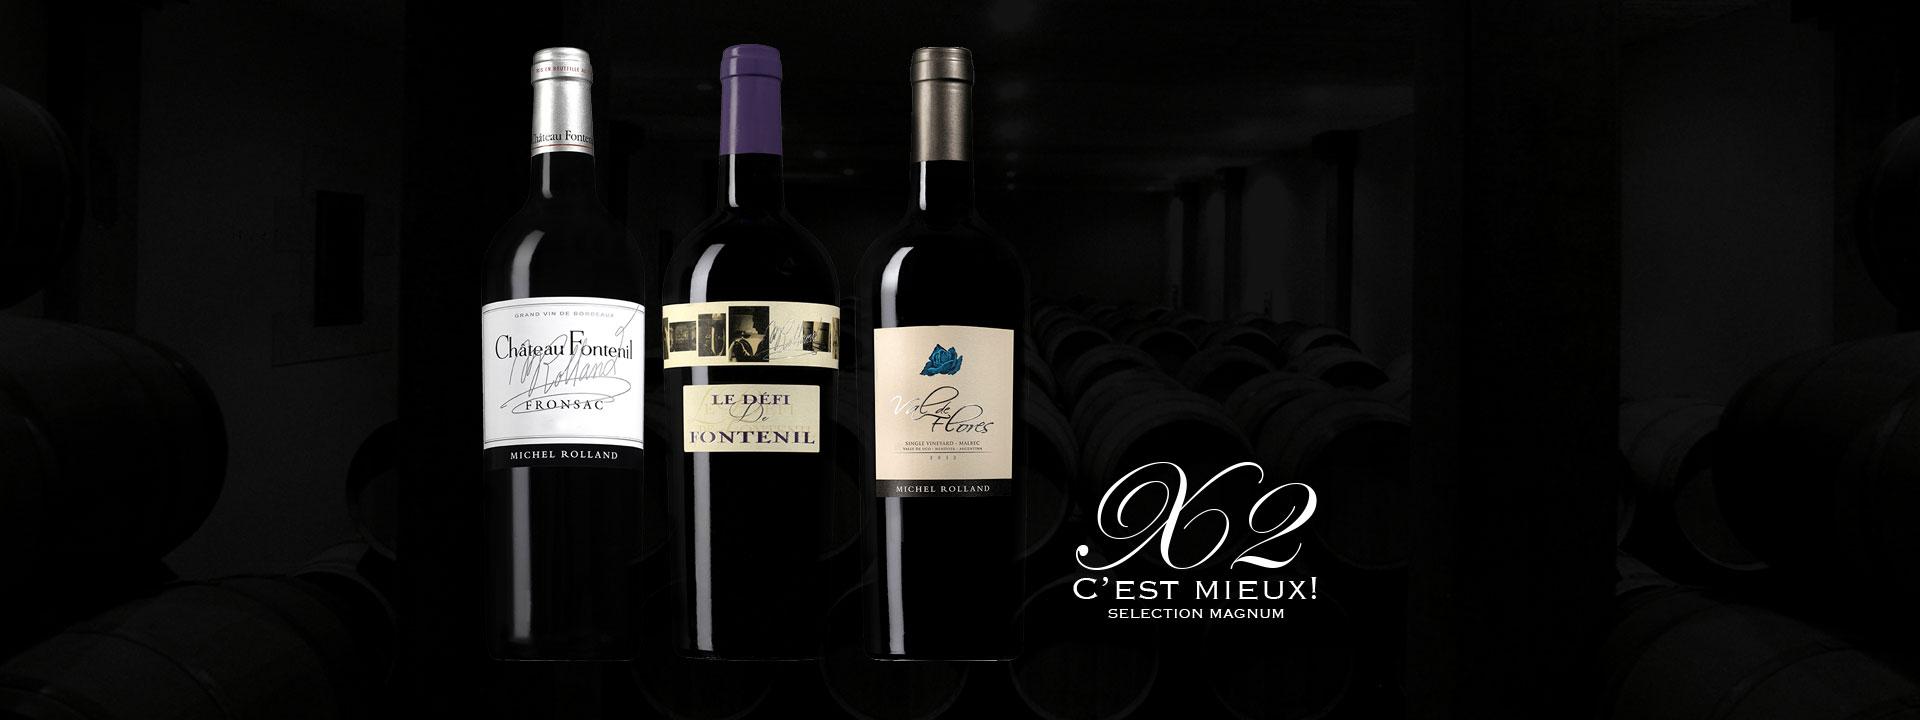 Château Fontenil 2015 Magnum - Rolland Collection